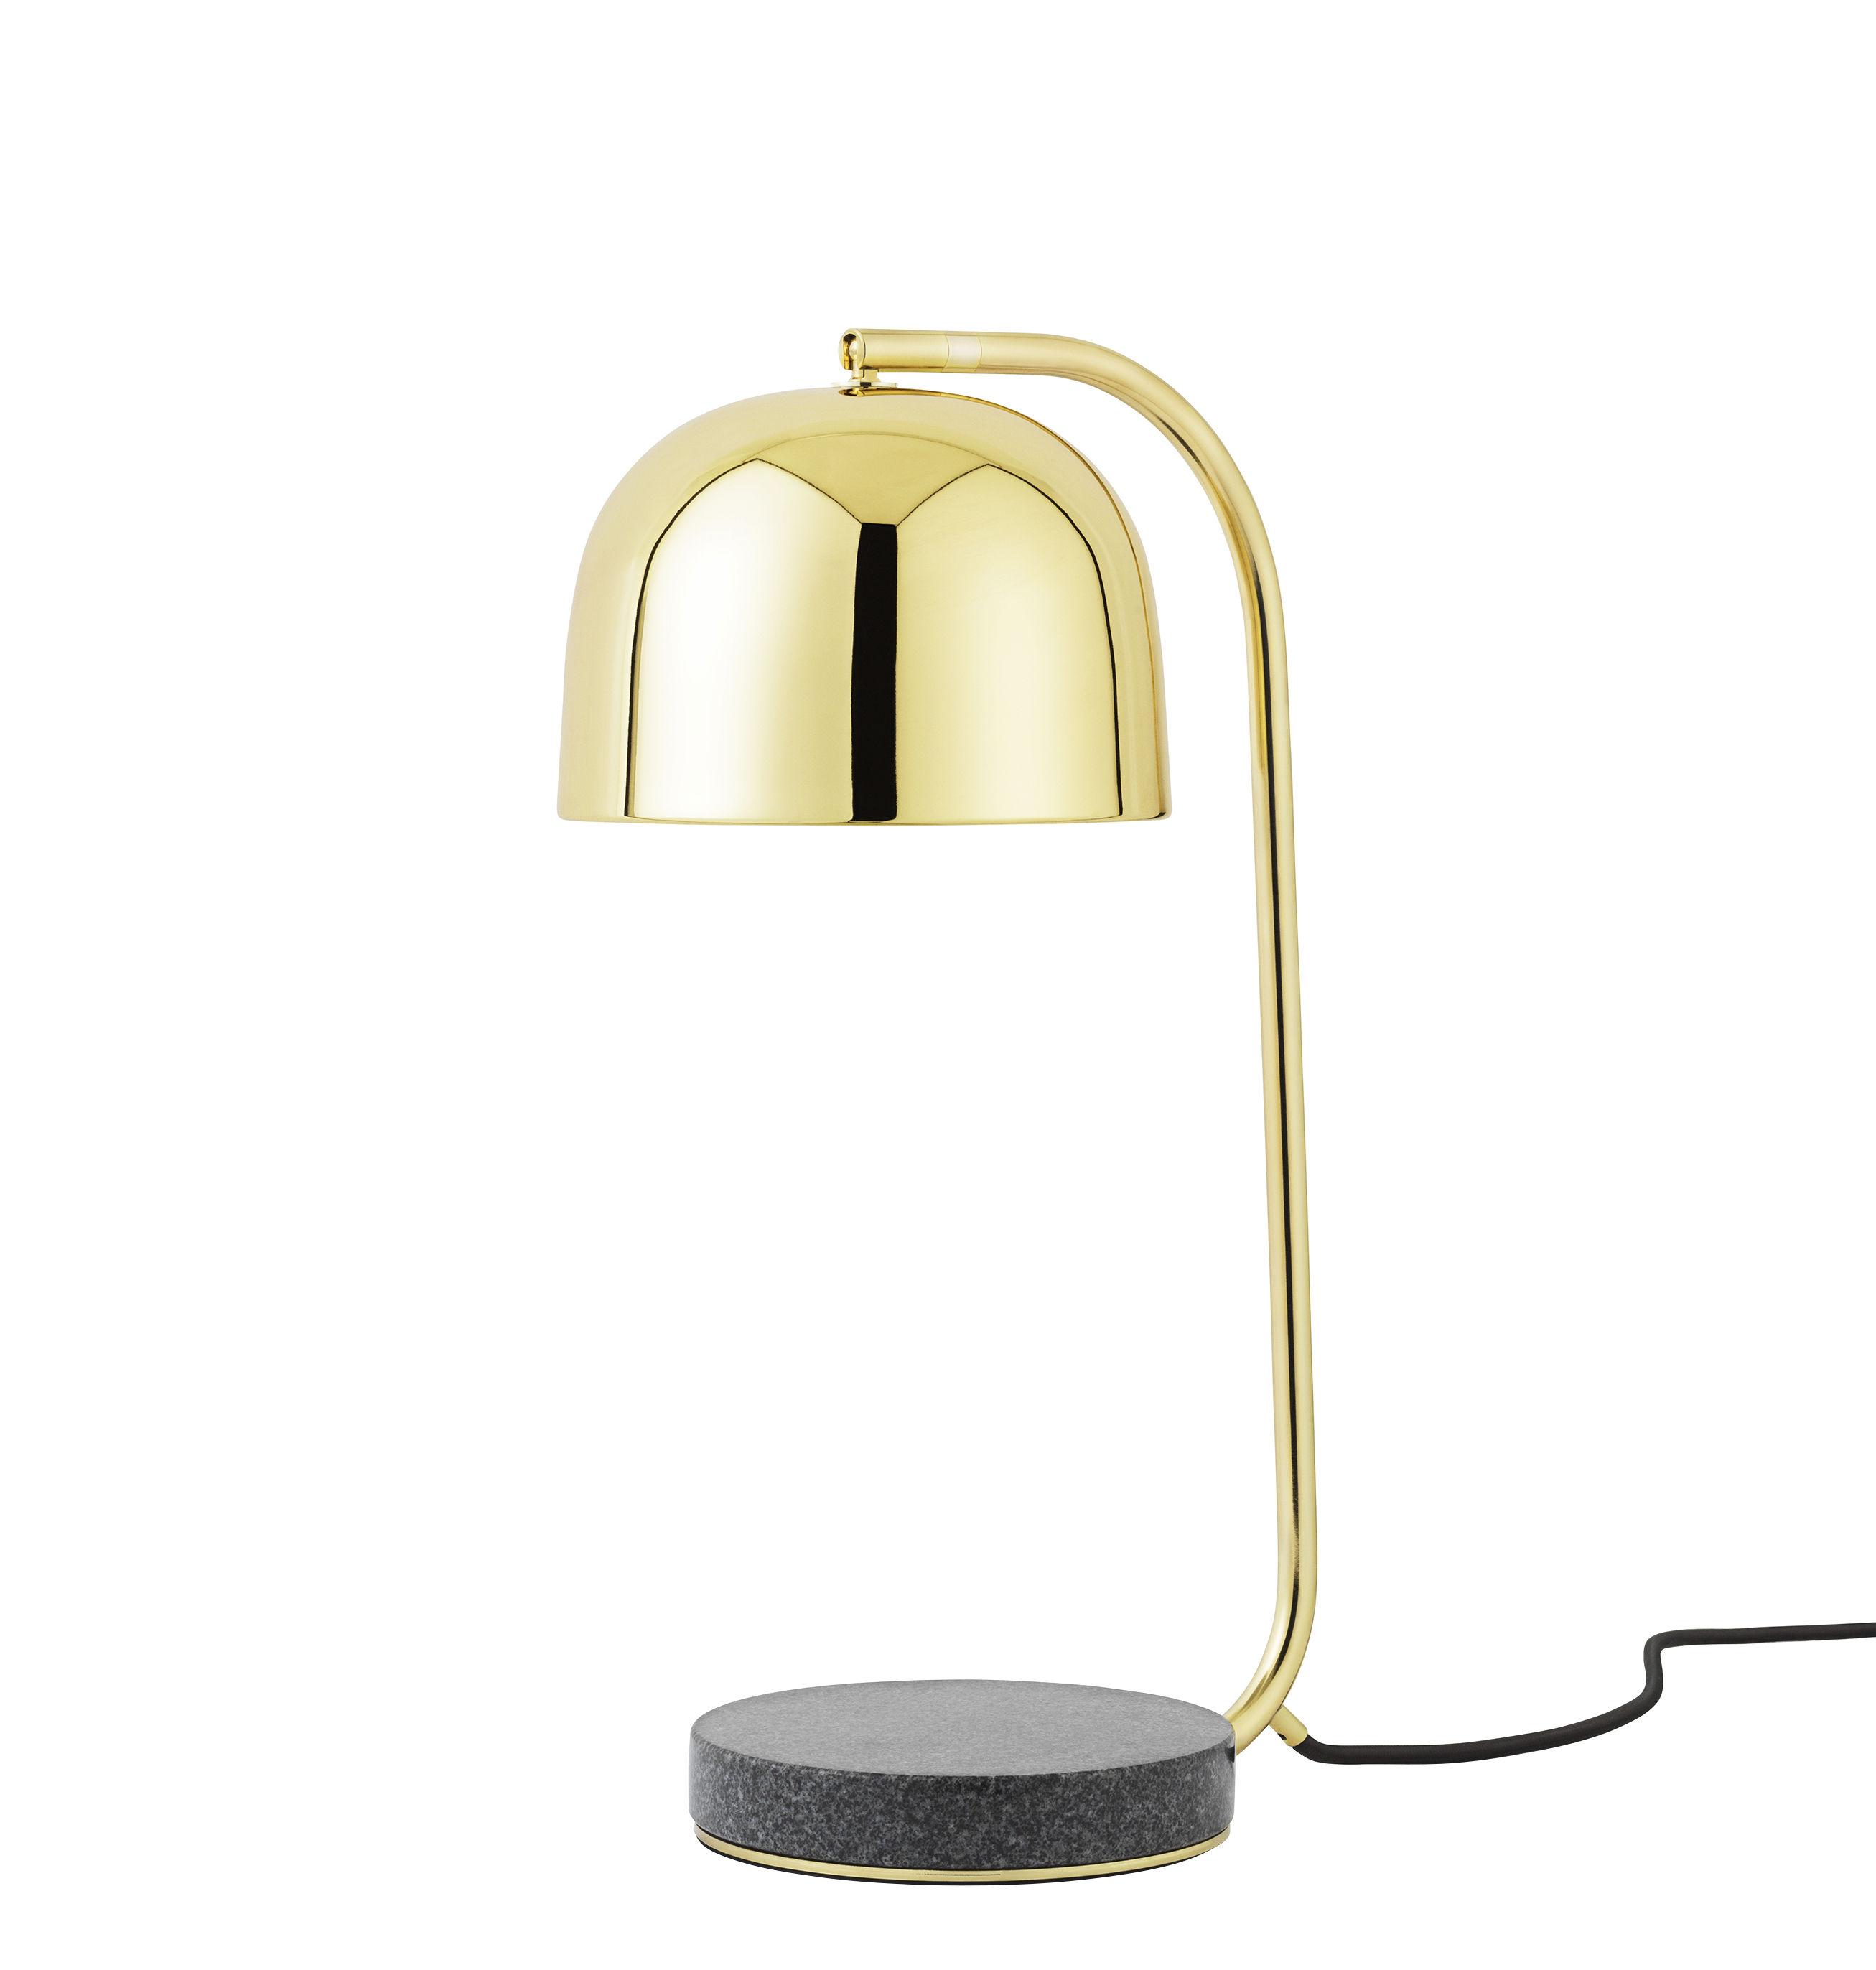 Luminaire - Lampes de table - Lampe de table Grant / Laiton & Base granite - Normann Copenhagen - Laiton - Granite, Laiton